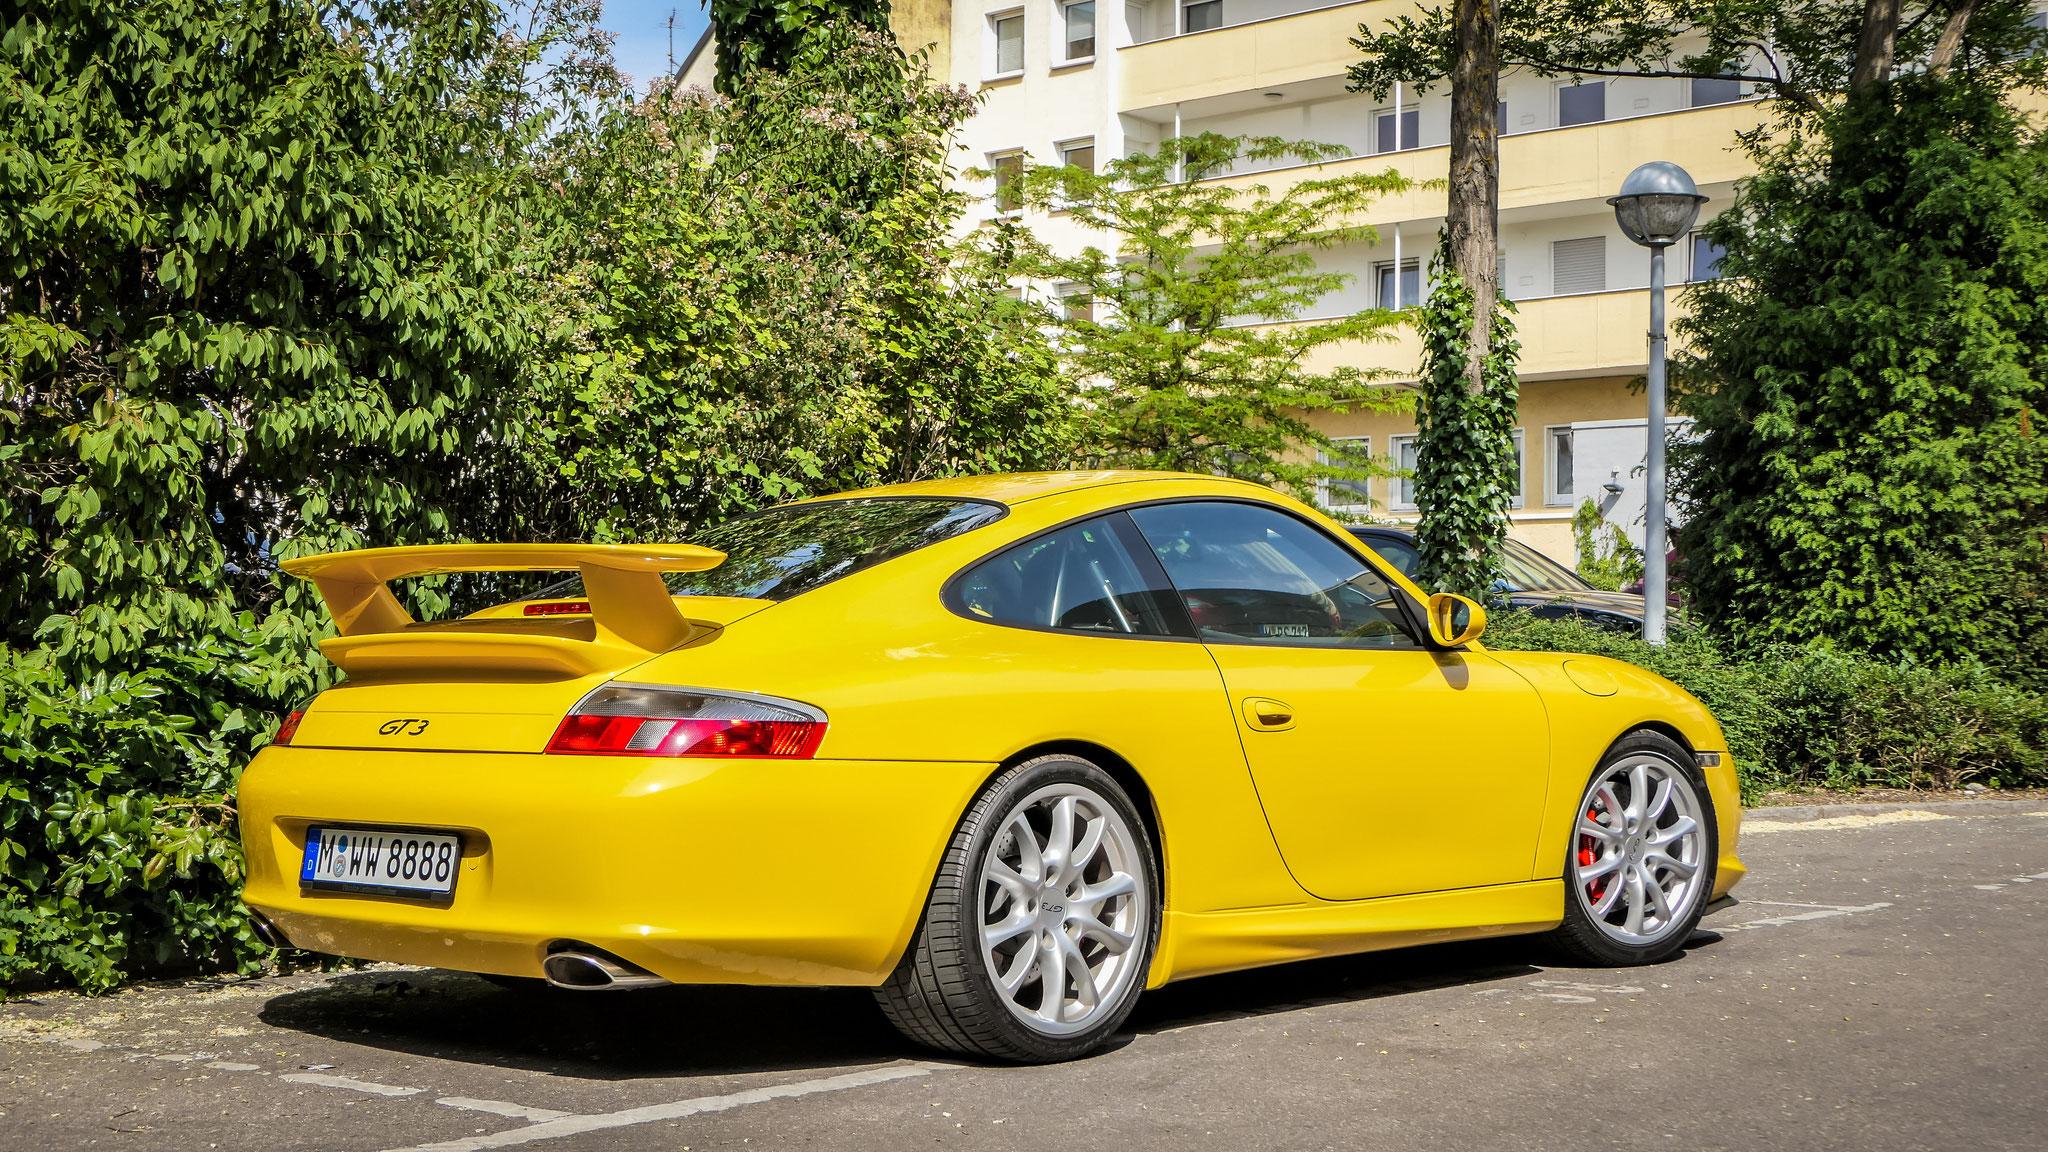 Porsche GT3 997 - M-WW-8888